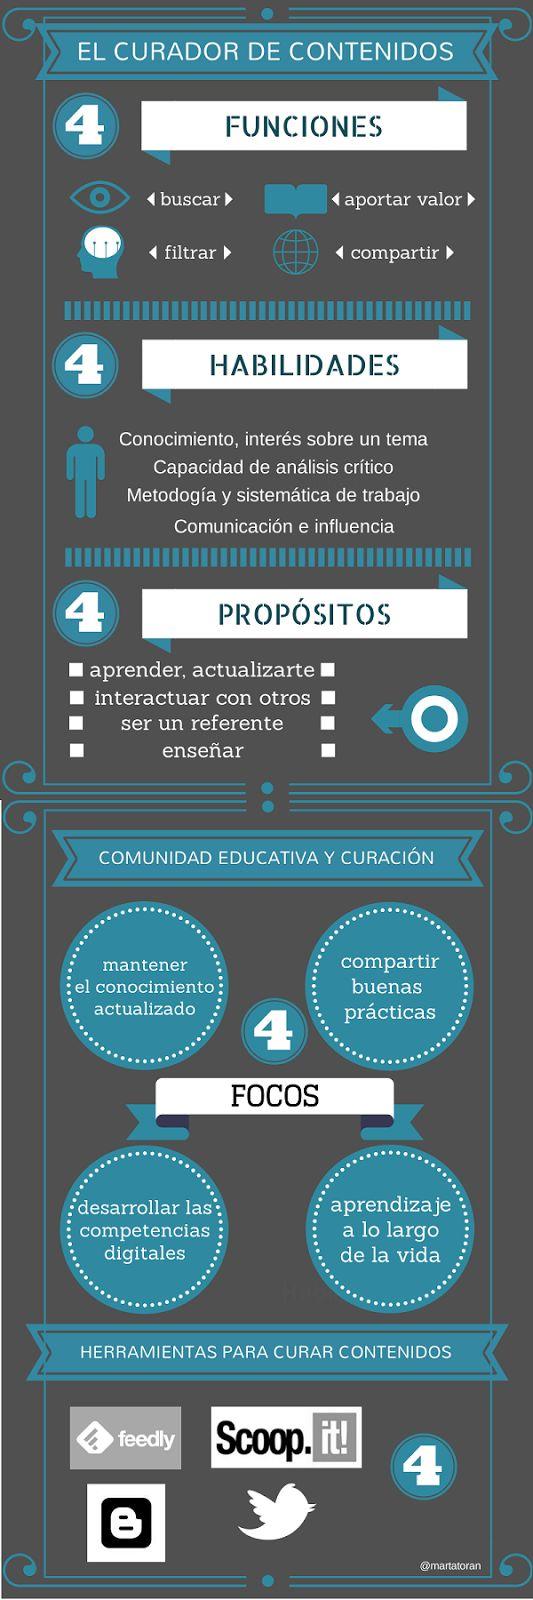 Sobre curación de contenidos #infografia by @martatoran